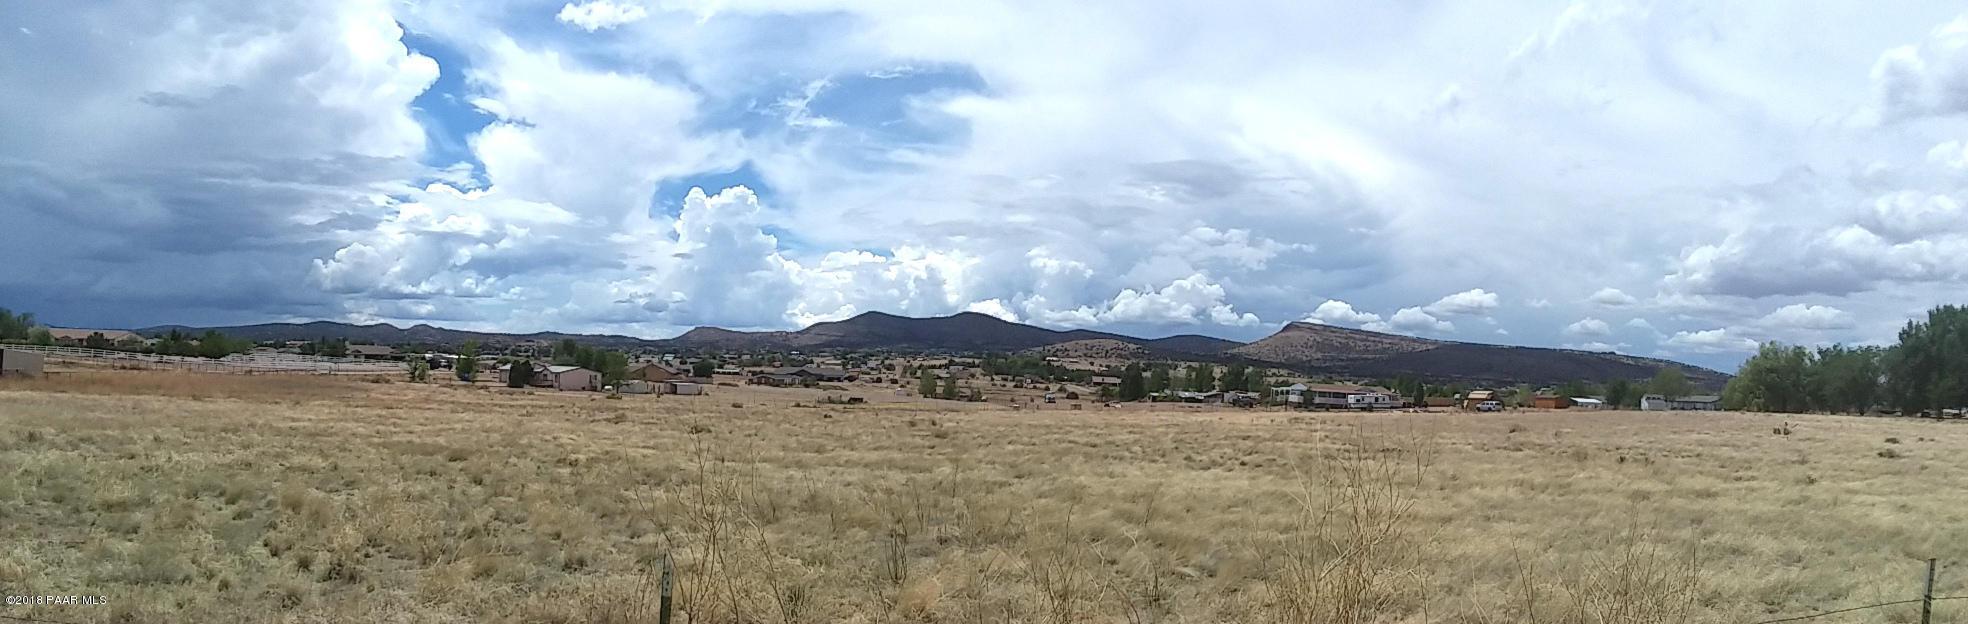 0 N Reed Road Chino Valley, AZ 86323 - MLS #: 1013773